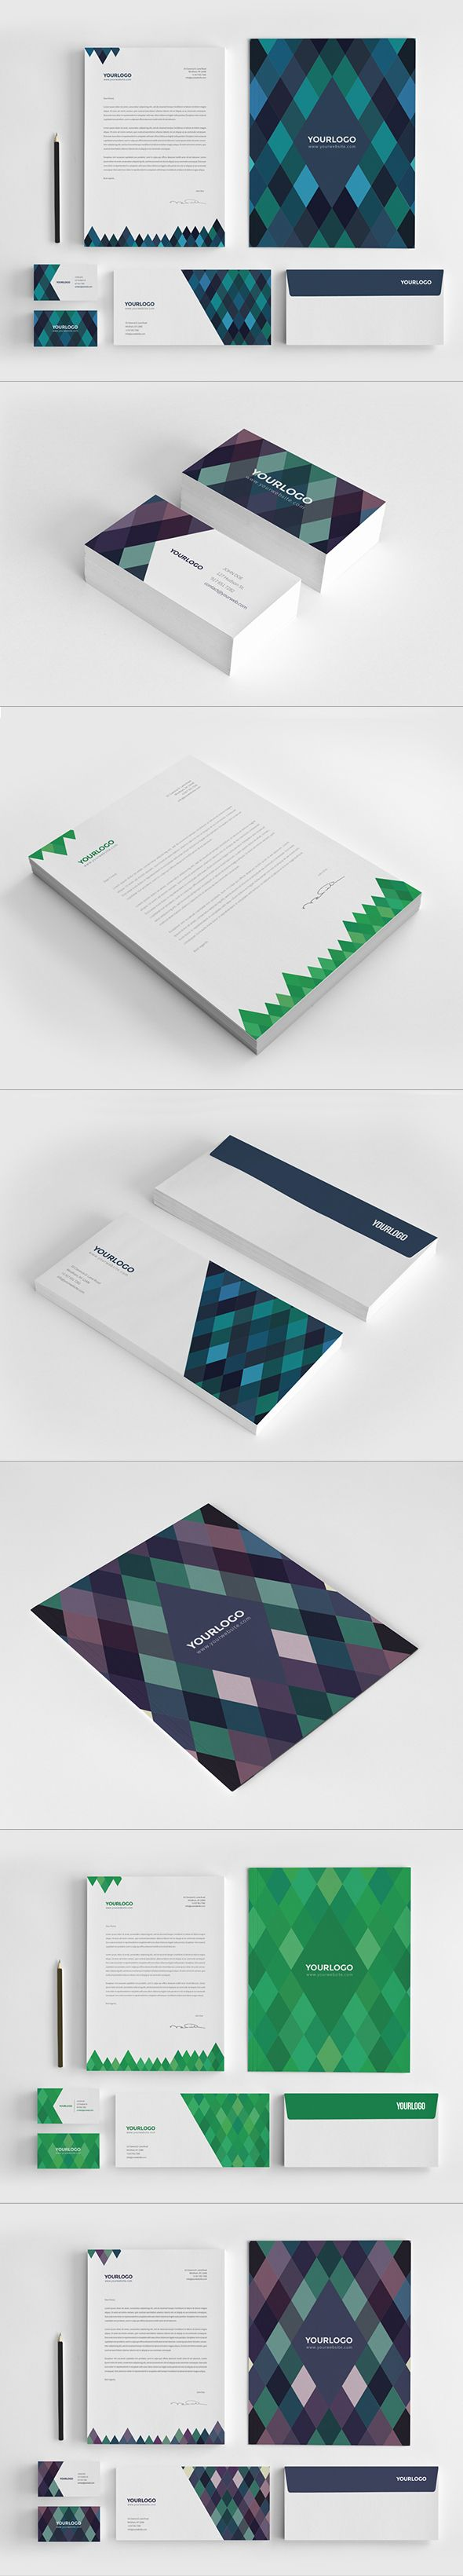 Farben/Muster